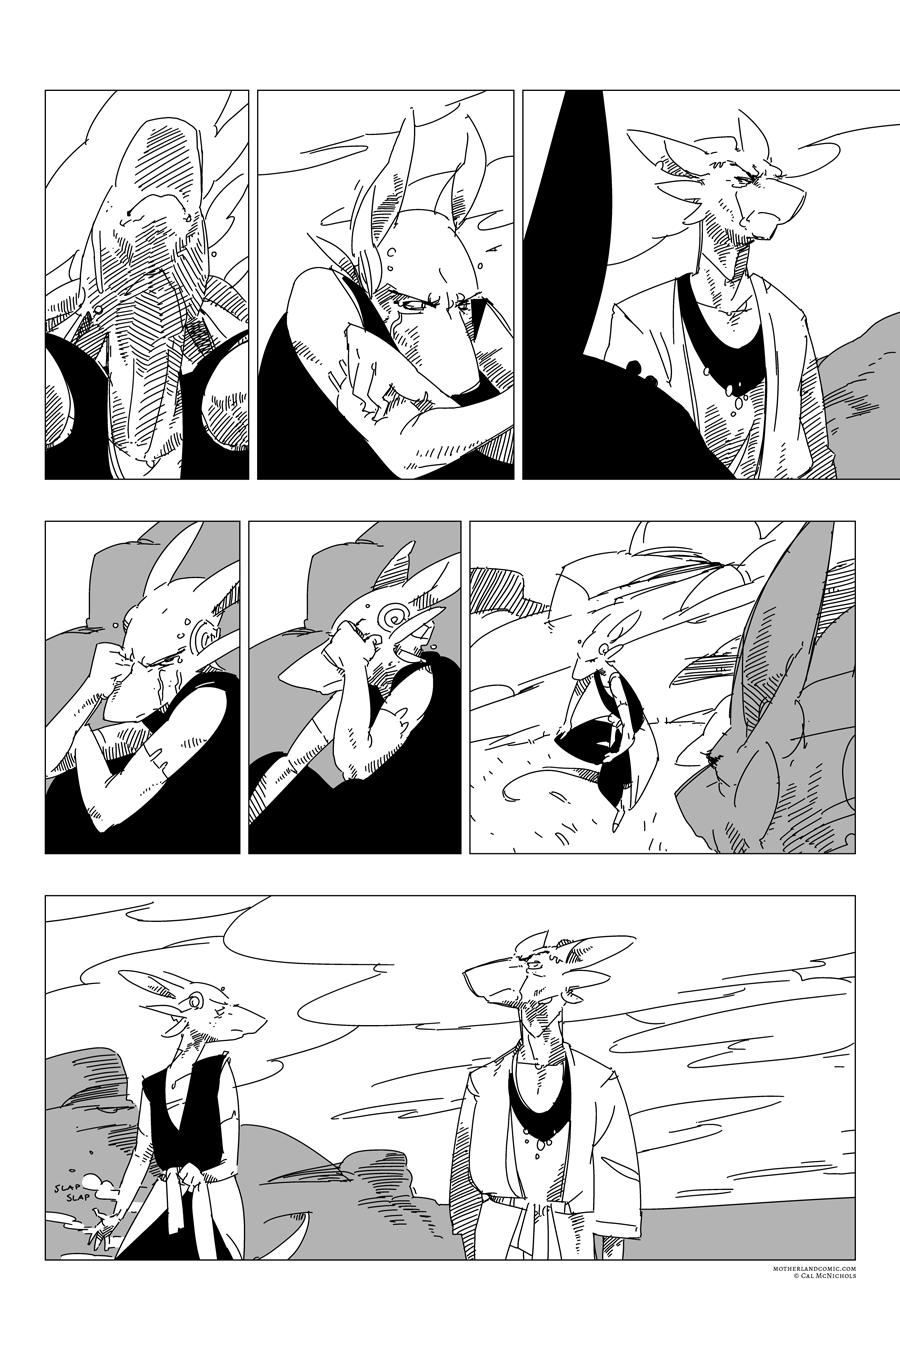 pg 73